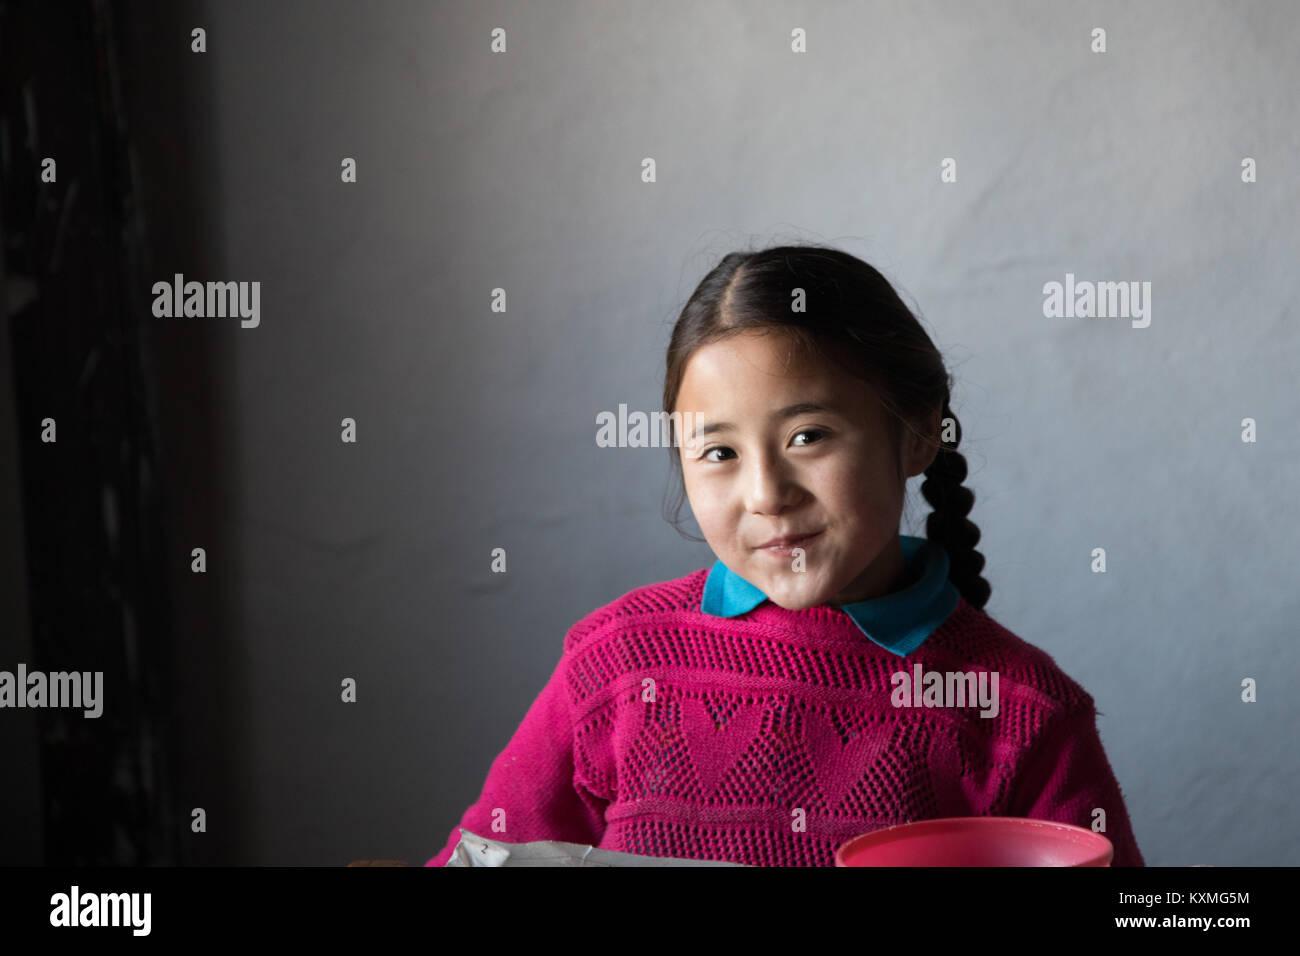 Lado rural kazajo mongol niña trenzas sonrisa Imagen De Stock